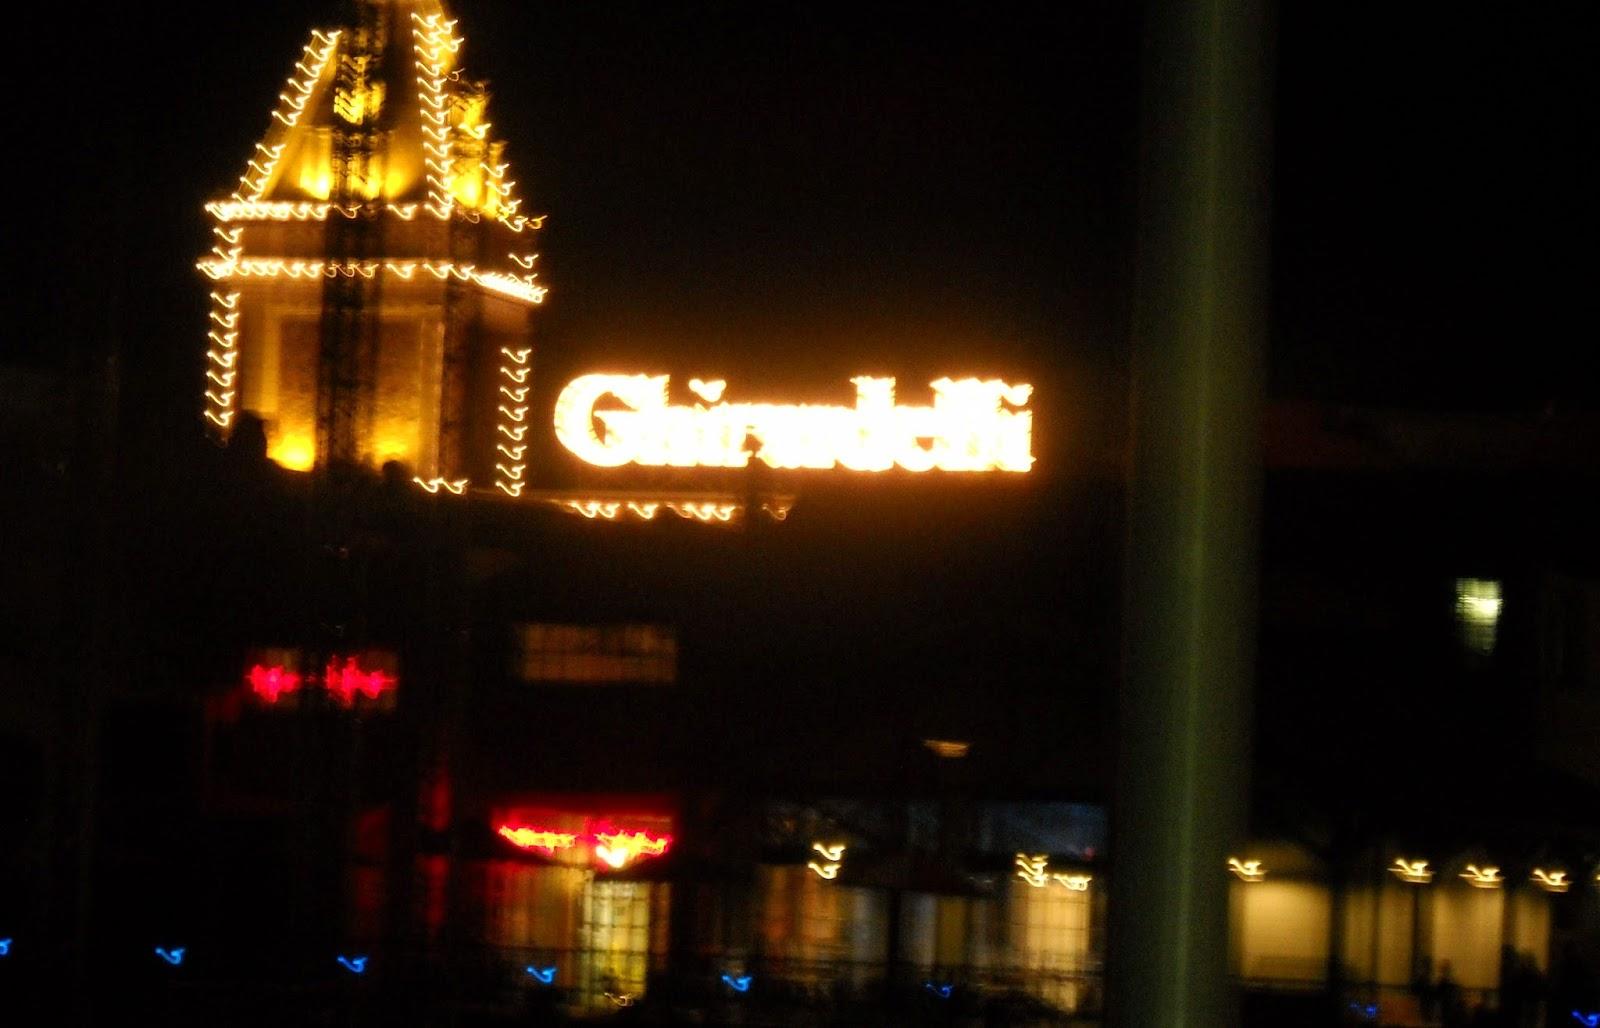 Ghiradelli Store in Downtown Disney